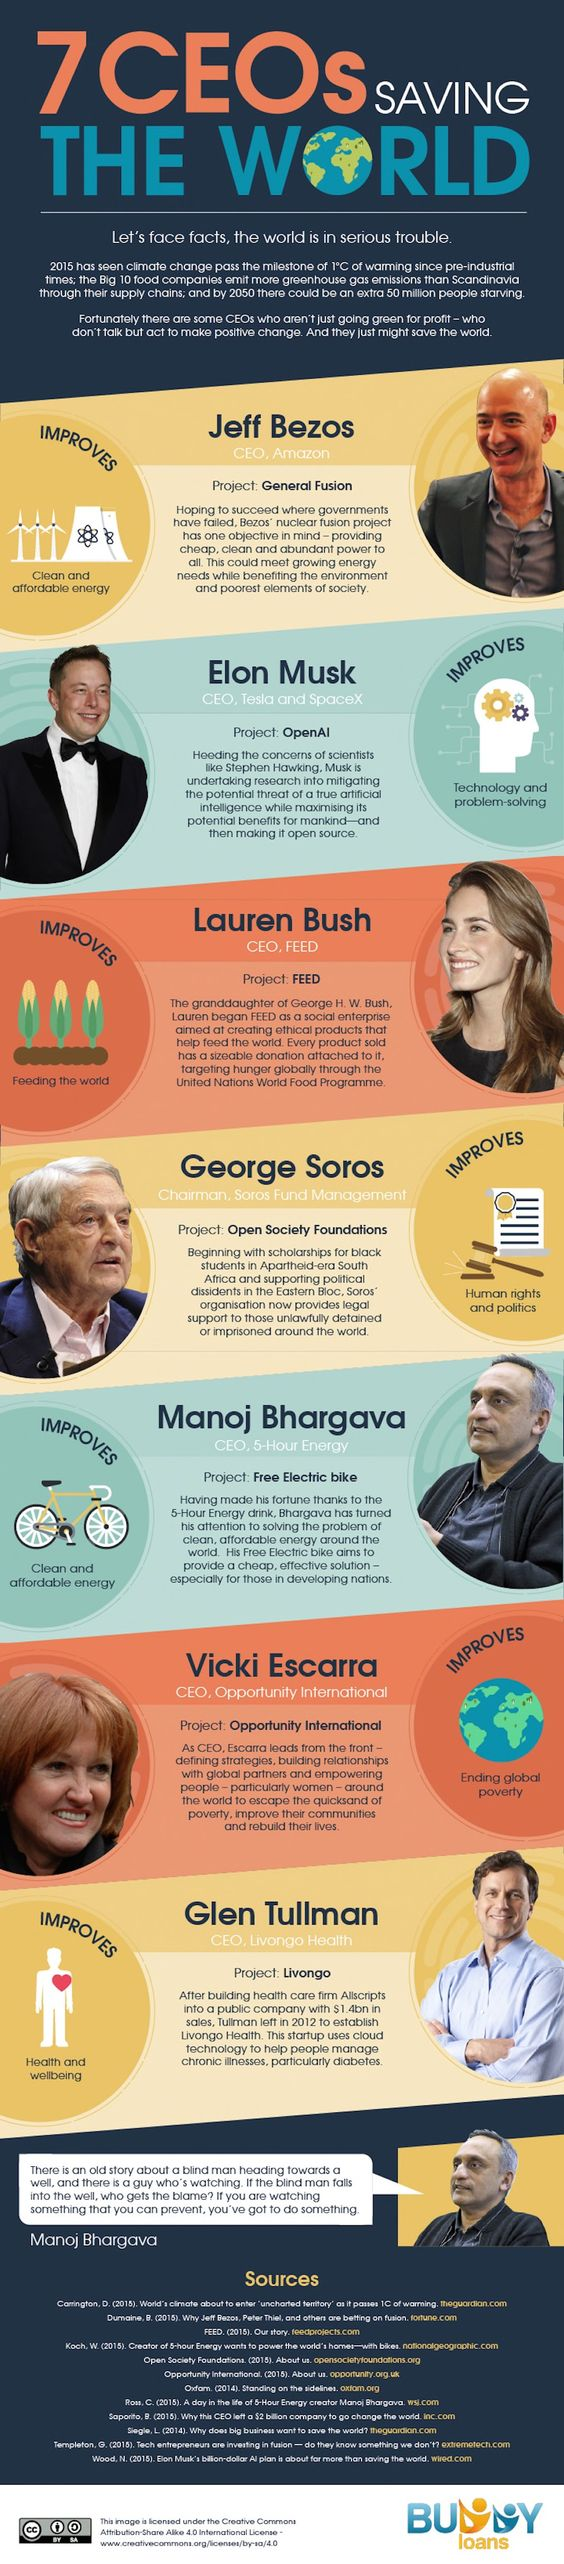 Buddy Loans, infographic, reader submitted content, CEOs saving the world, jeff bezos, elon musk, lauren bush, george soros, manoj bhargava, vicki escarra, glen tullman,